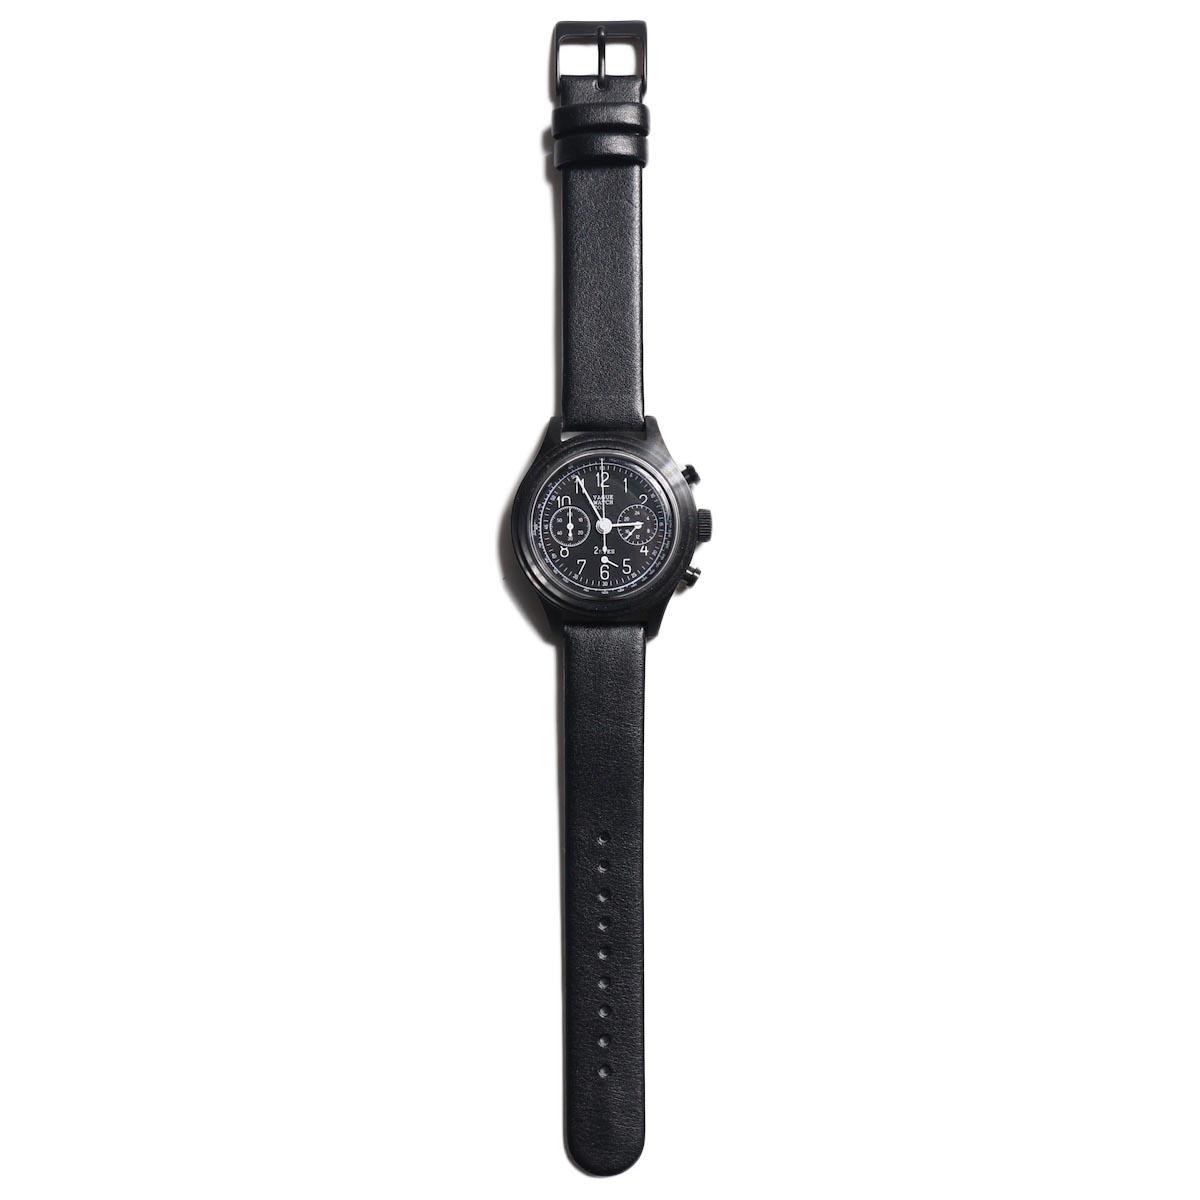 Vague Watch Co. / 2EYES クロノグラフ -Black